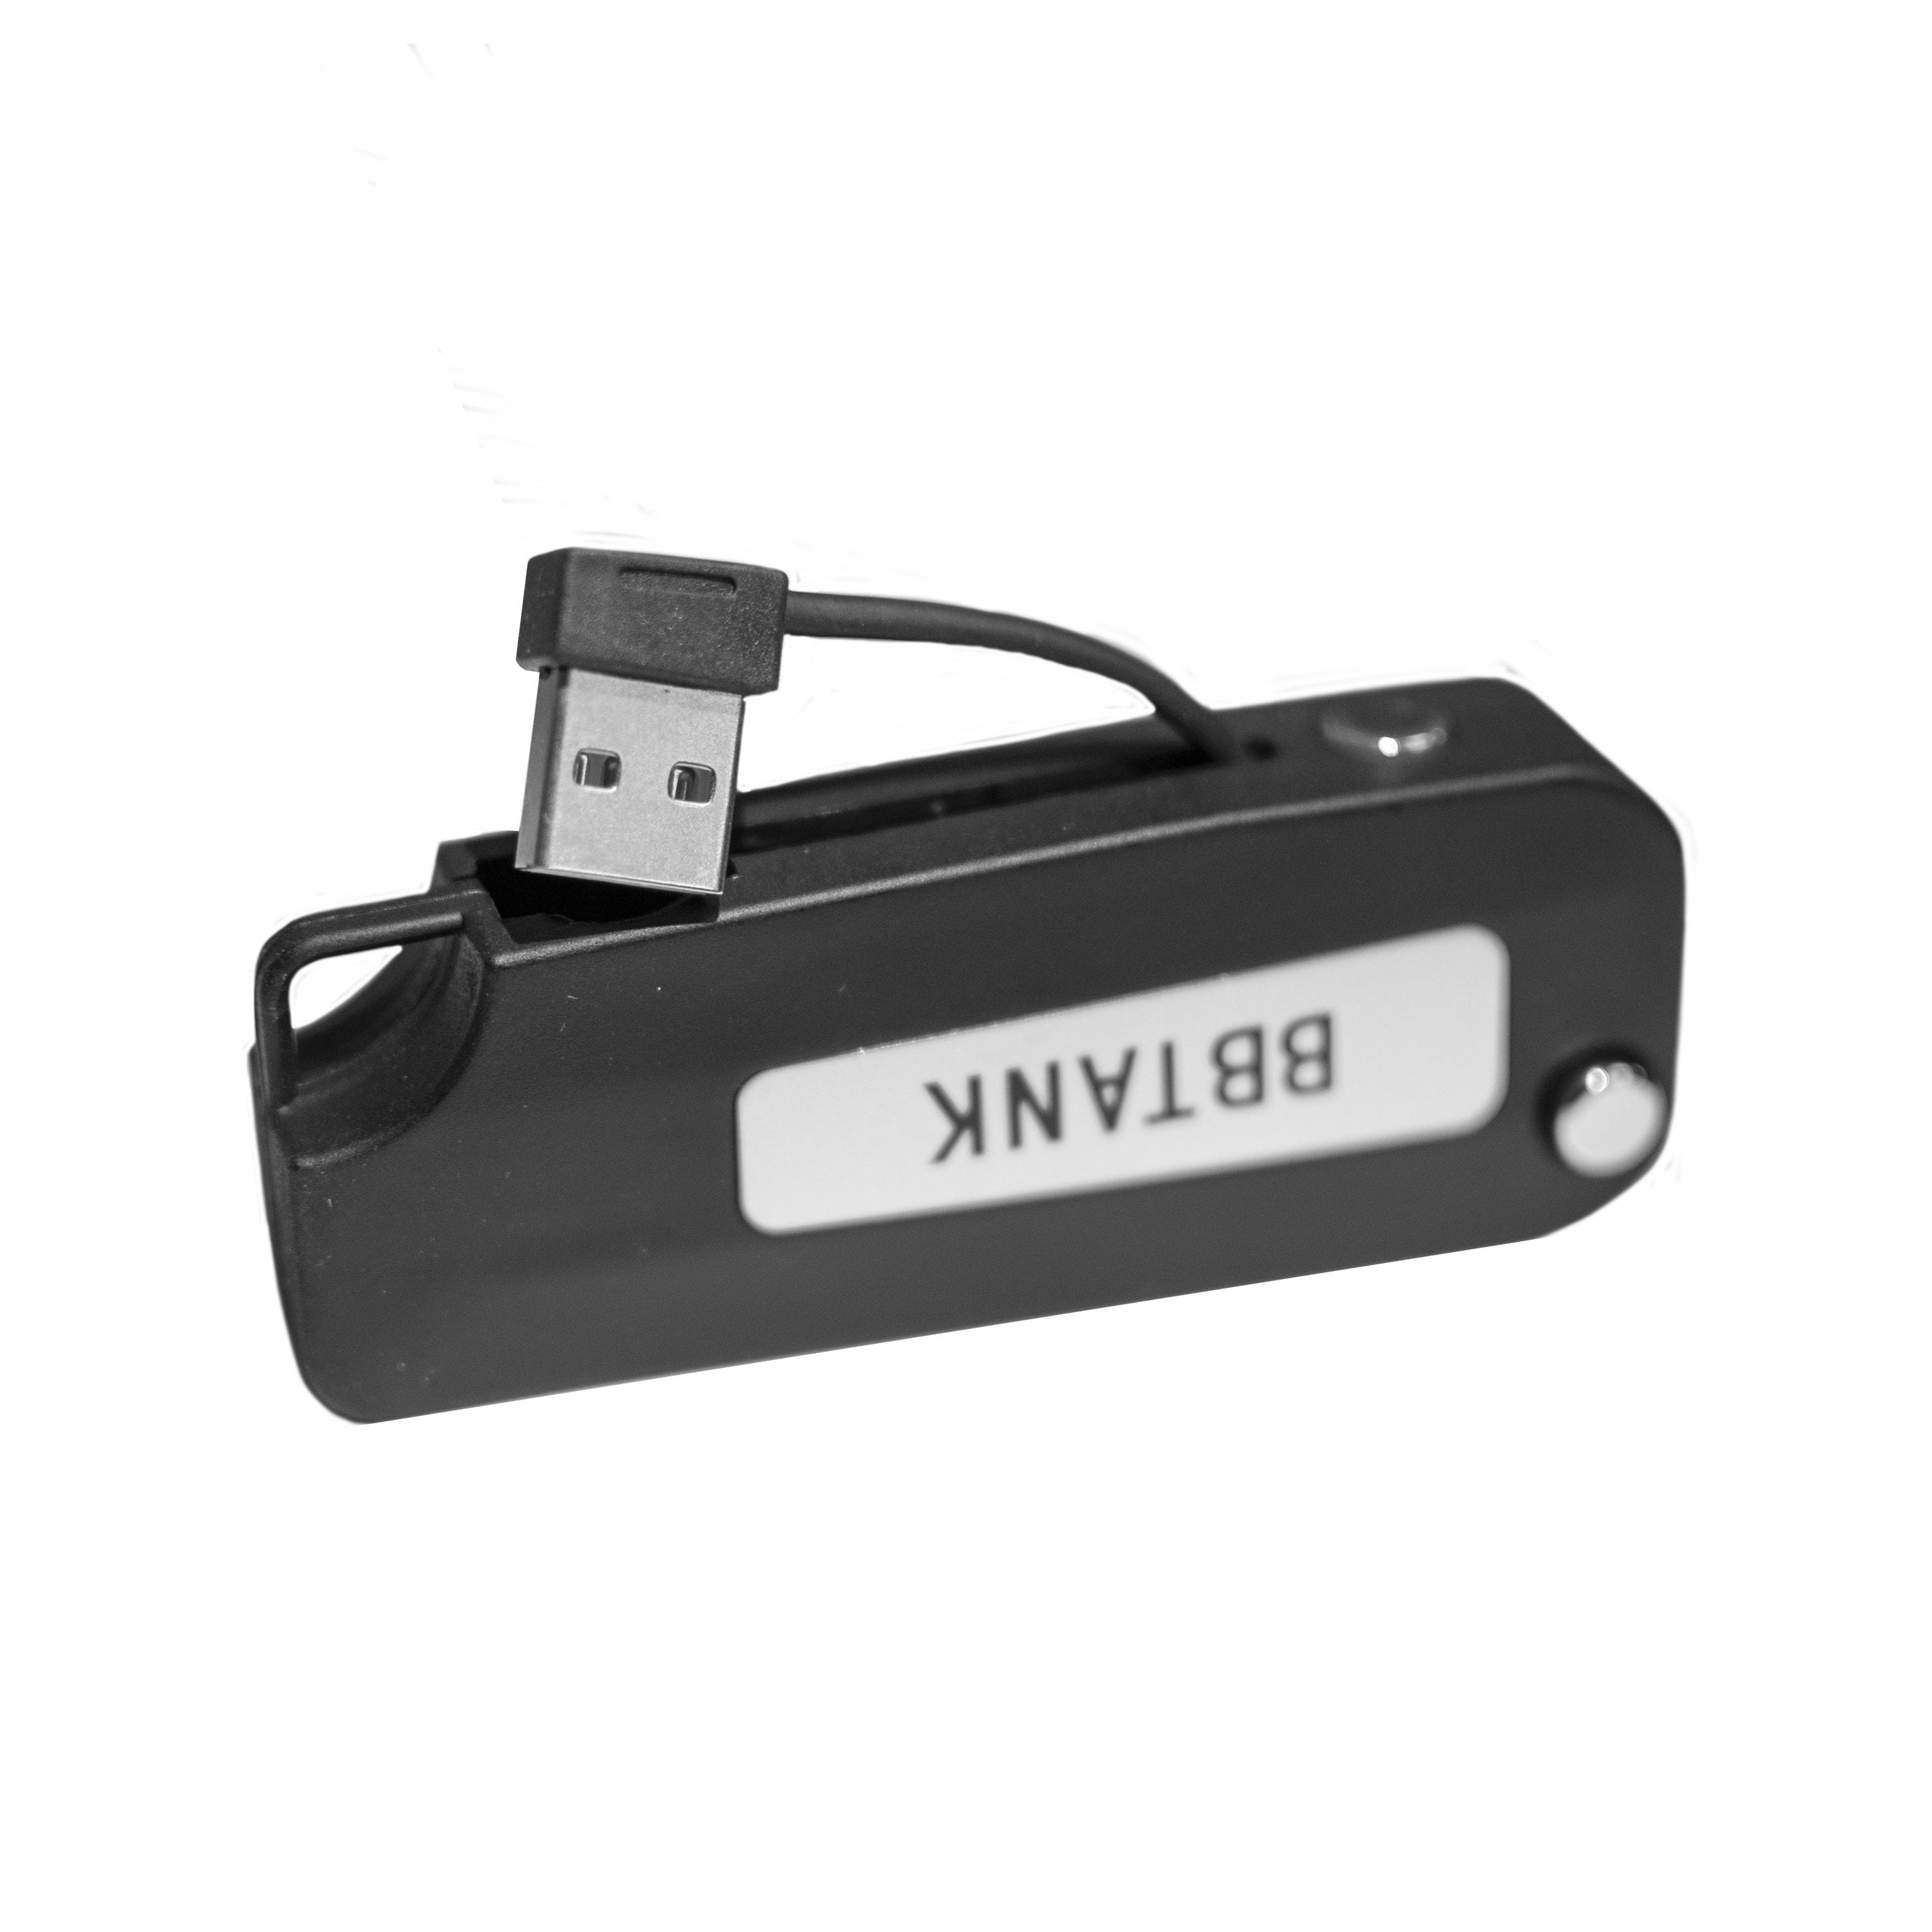 BB Tank Vaporizer Battery | Bulk Wholesale Marijuana Packaging, Vape  Cartridges, Joint Tubes, Custom Labels, and More!